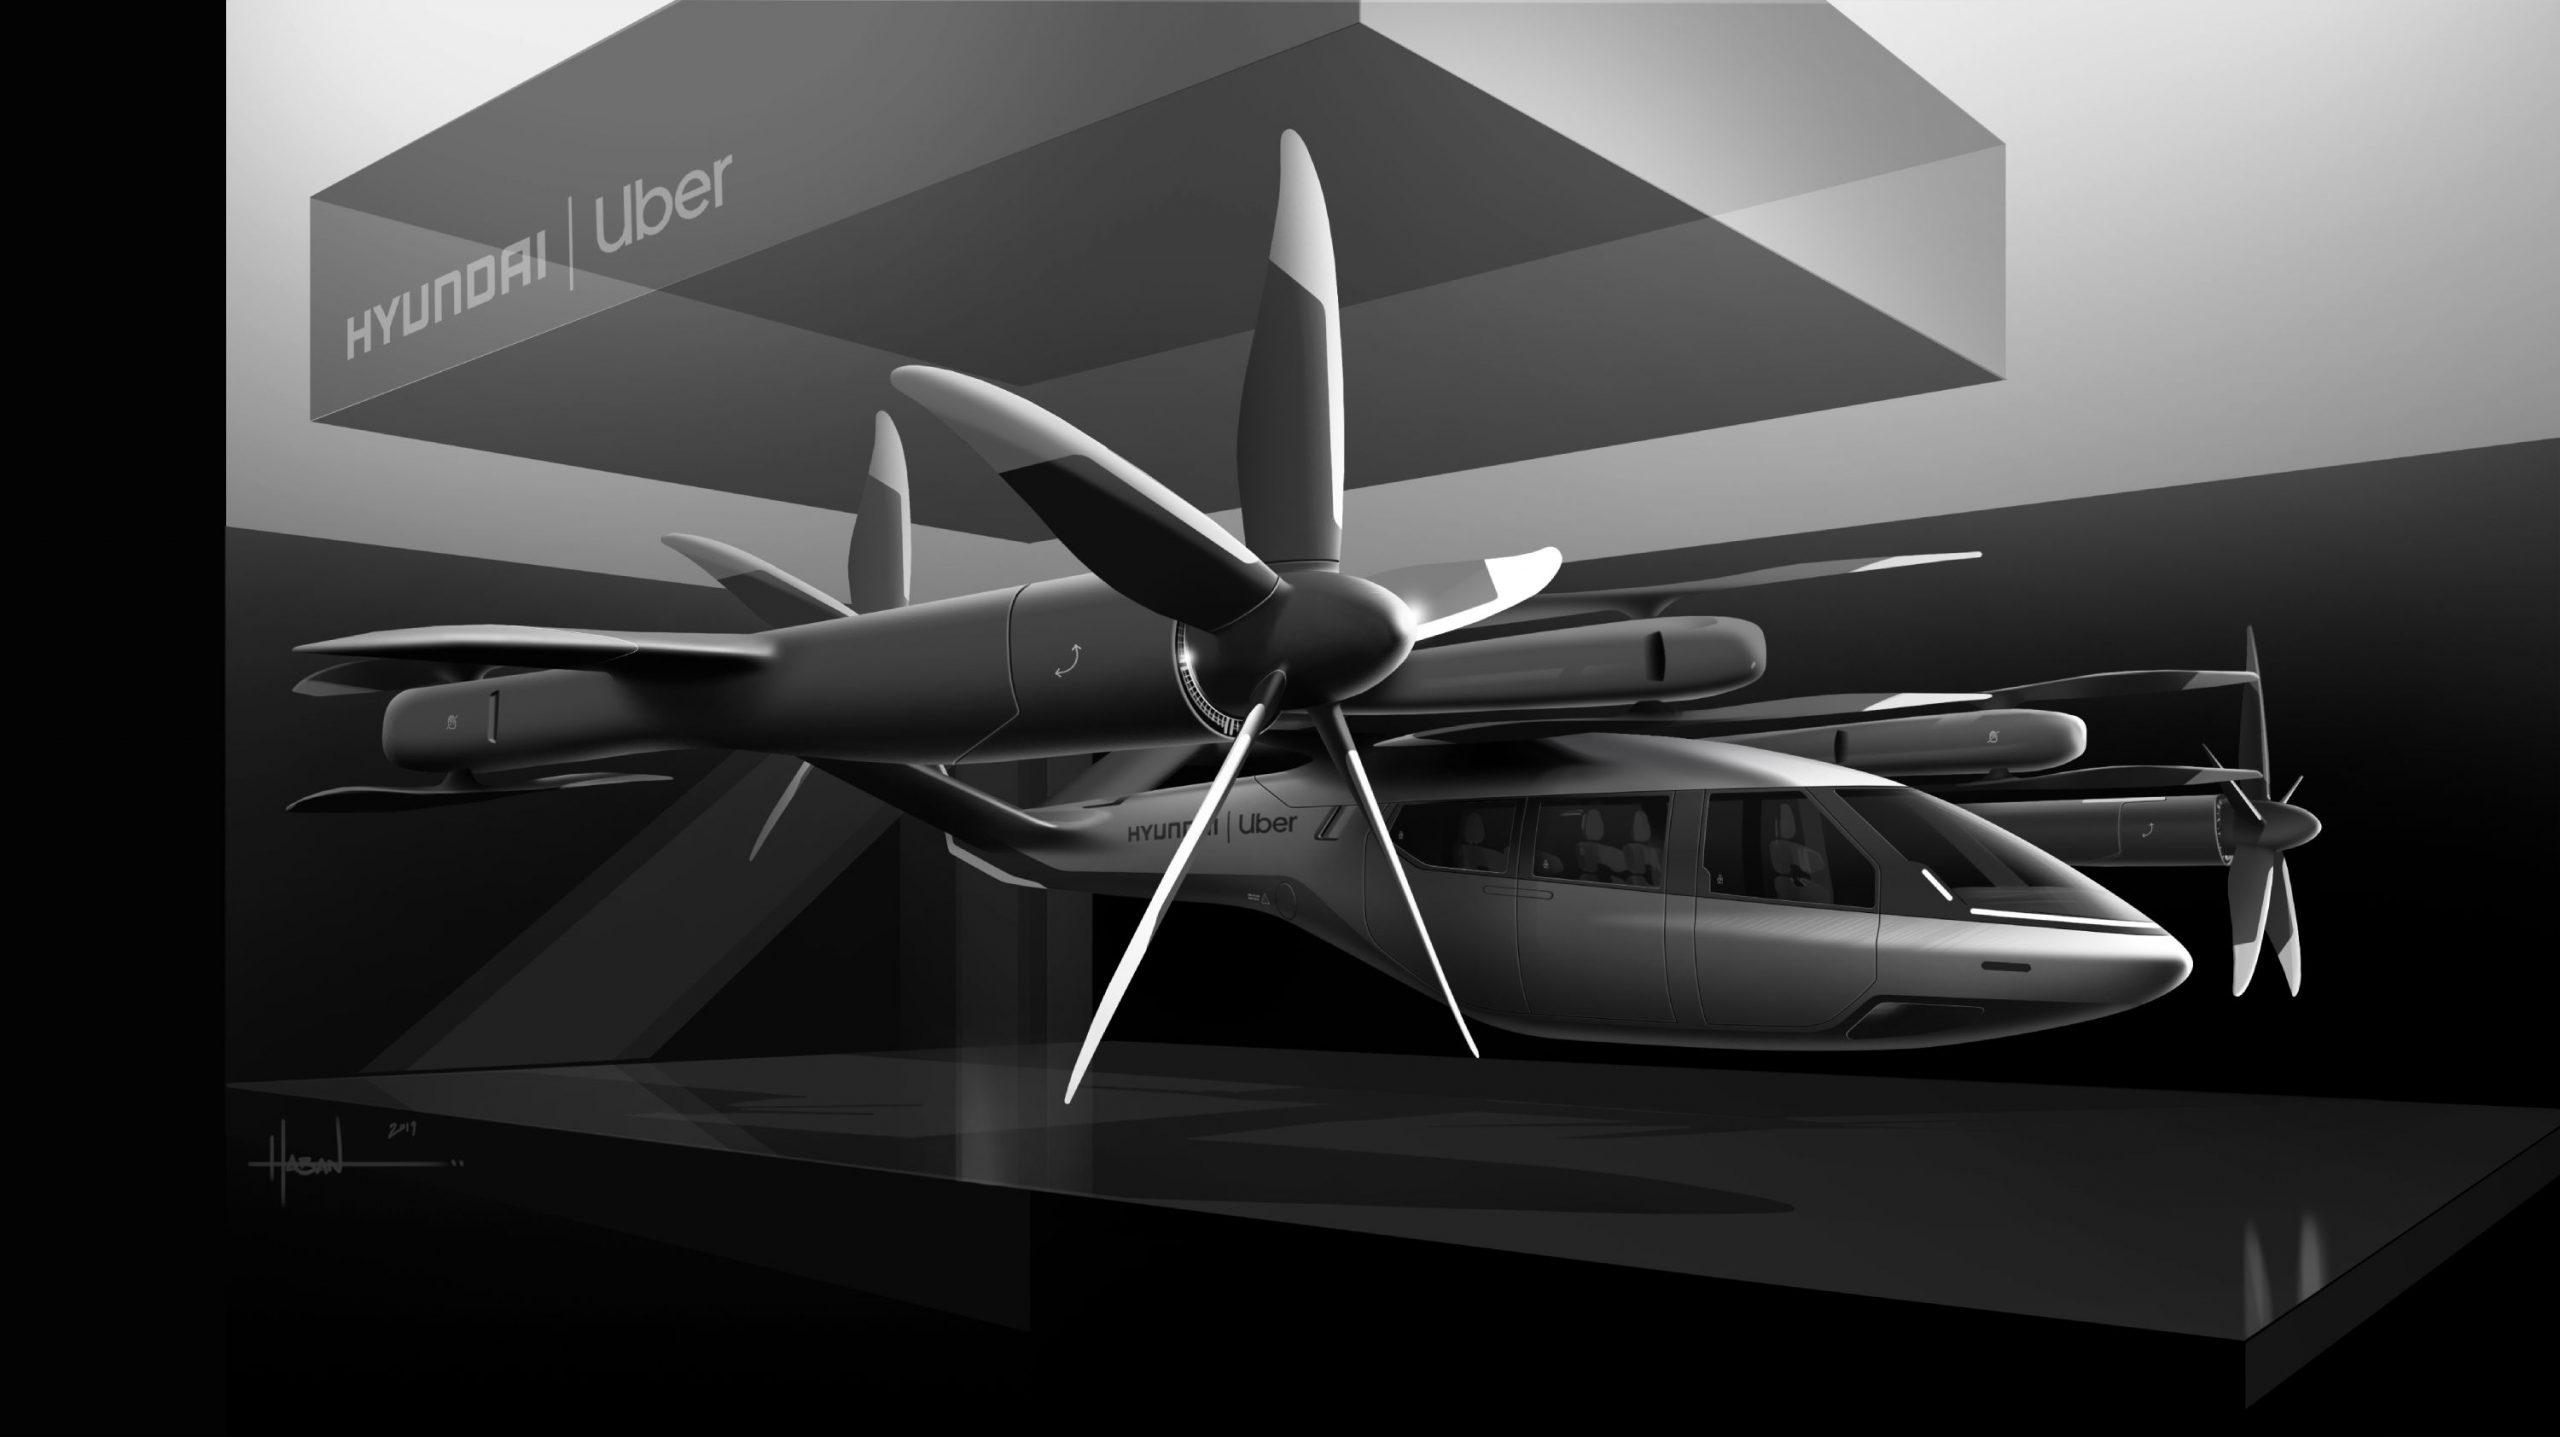 Hyundai 2030'da uçacak